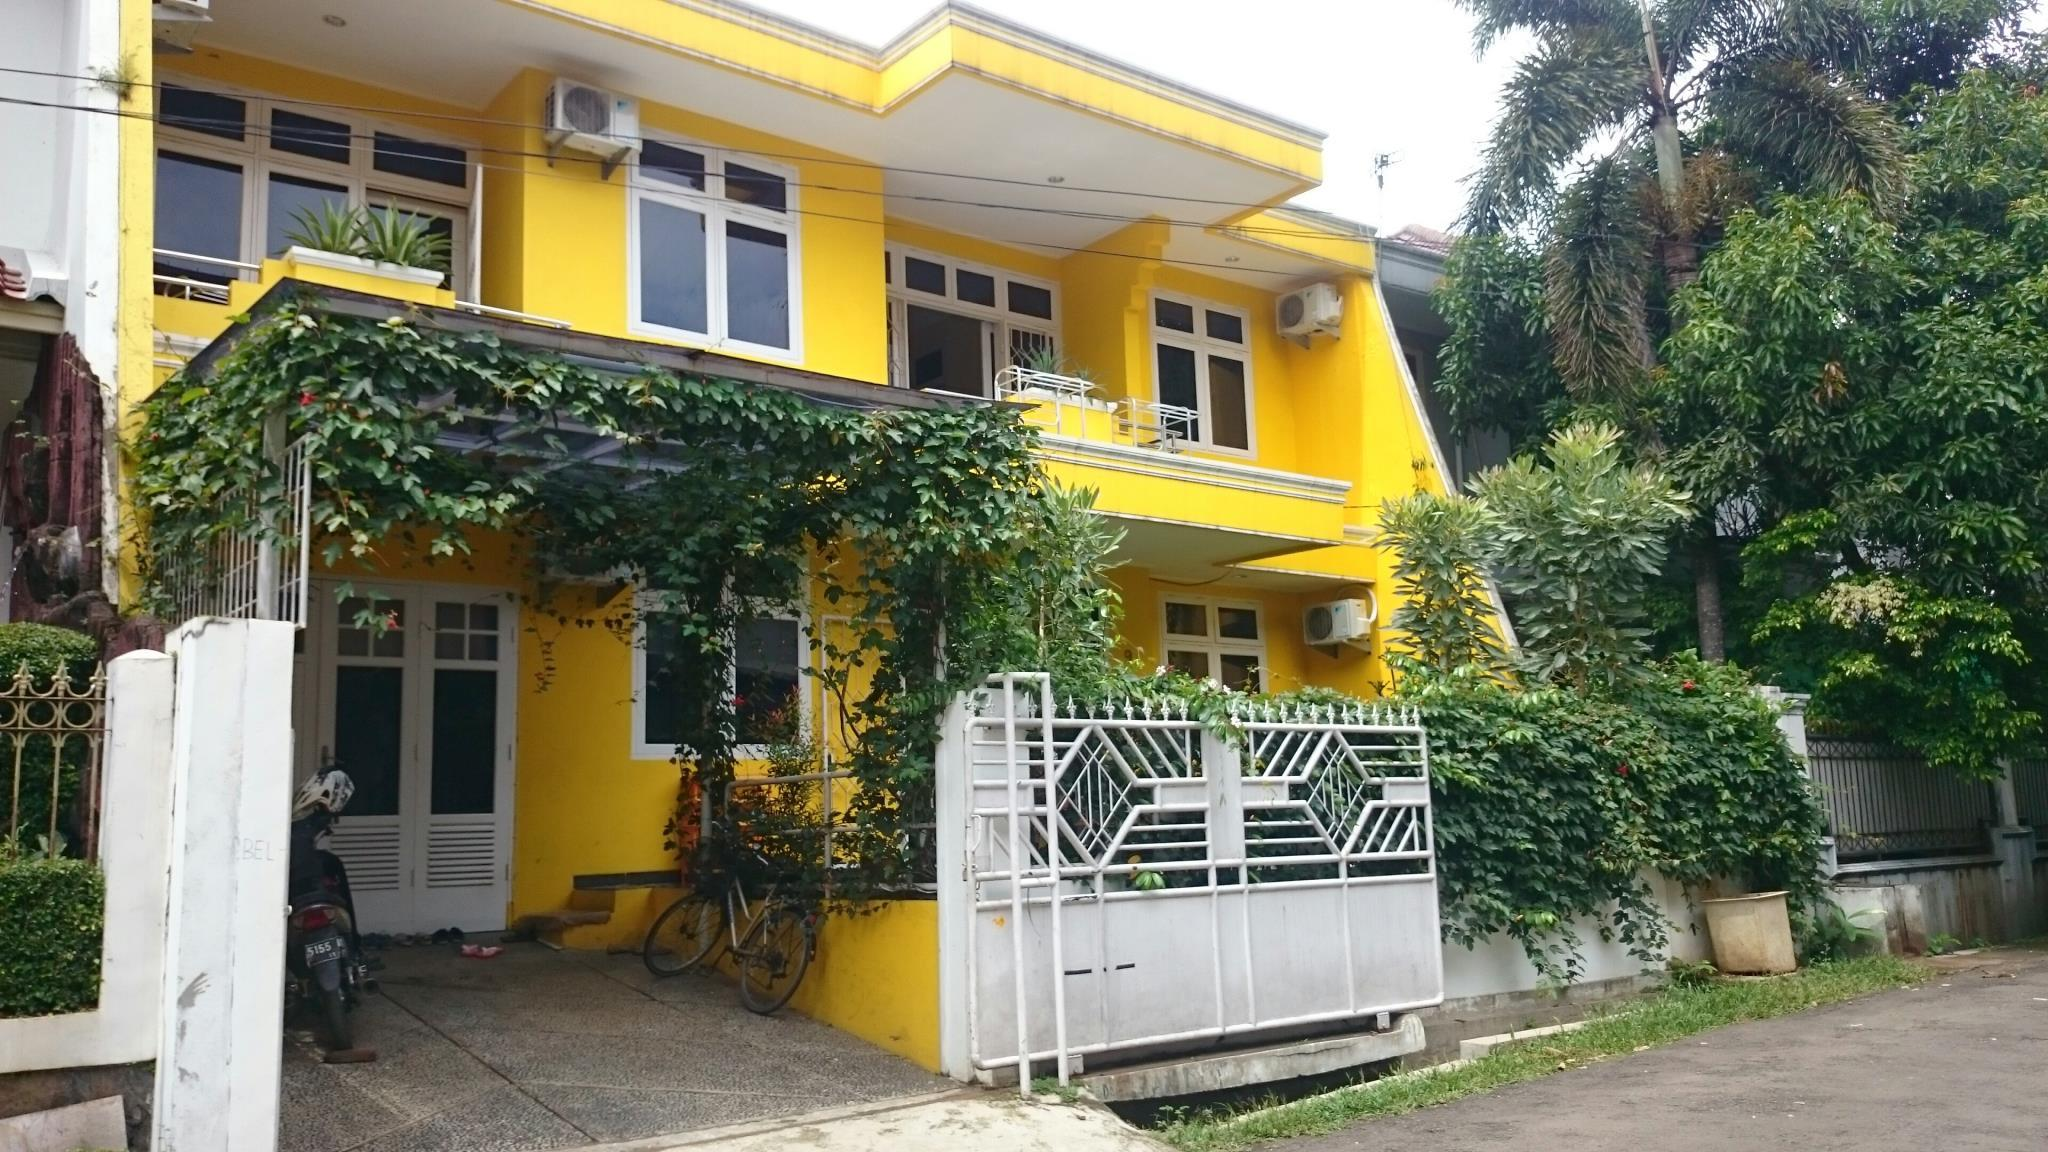 Hotel Cendana Mulia Hostel Bogor - Jalan Cendana Mulia 1 No.9 Pajajaran - Bogor